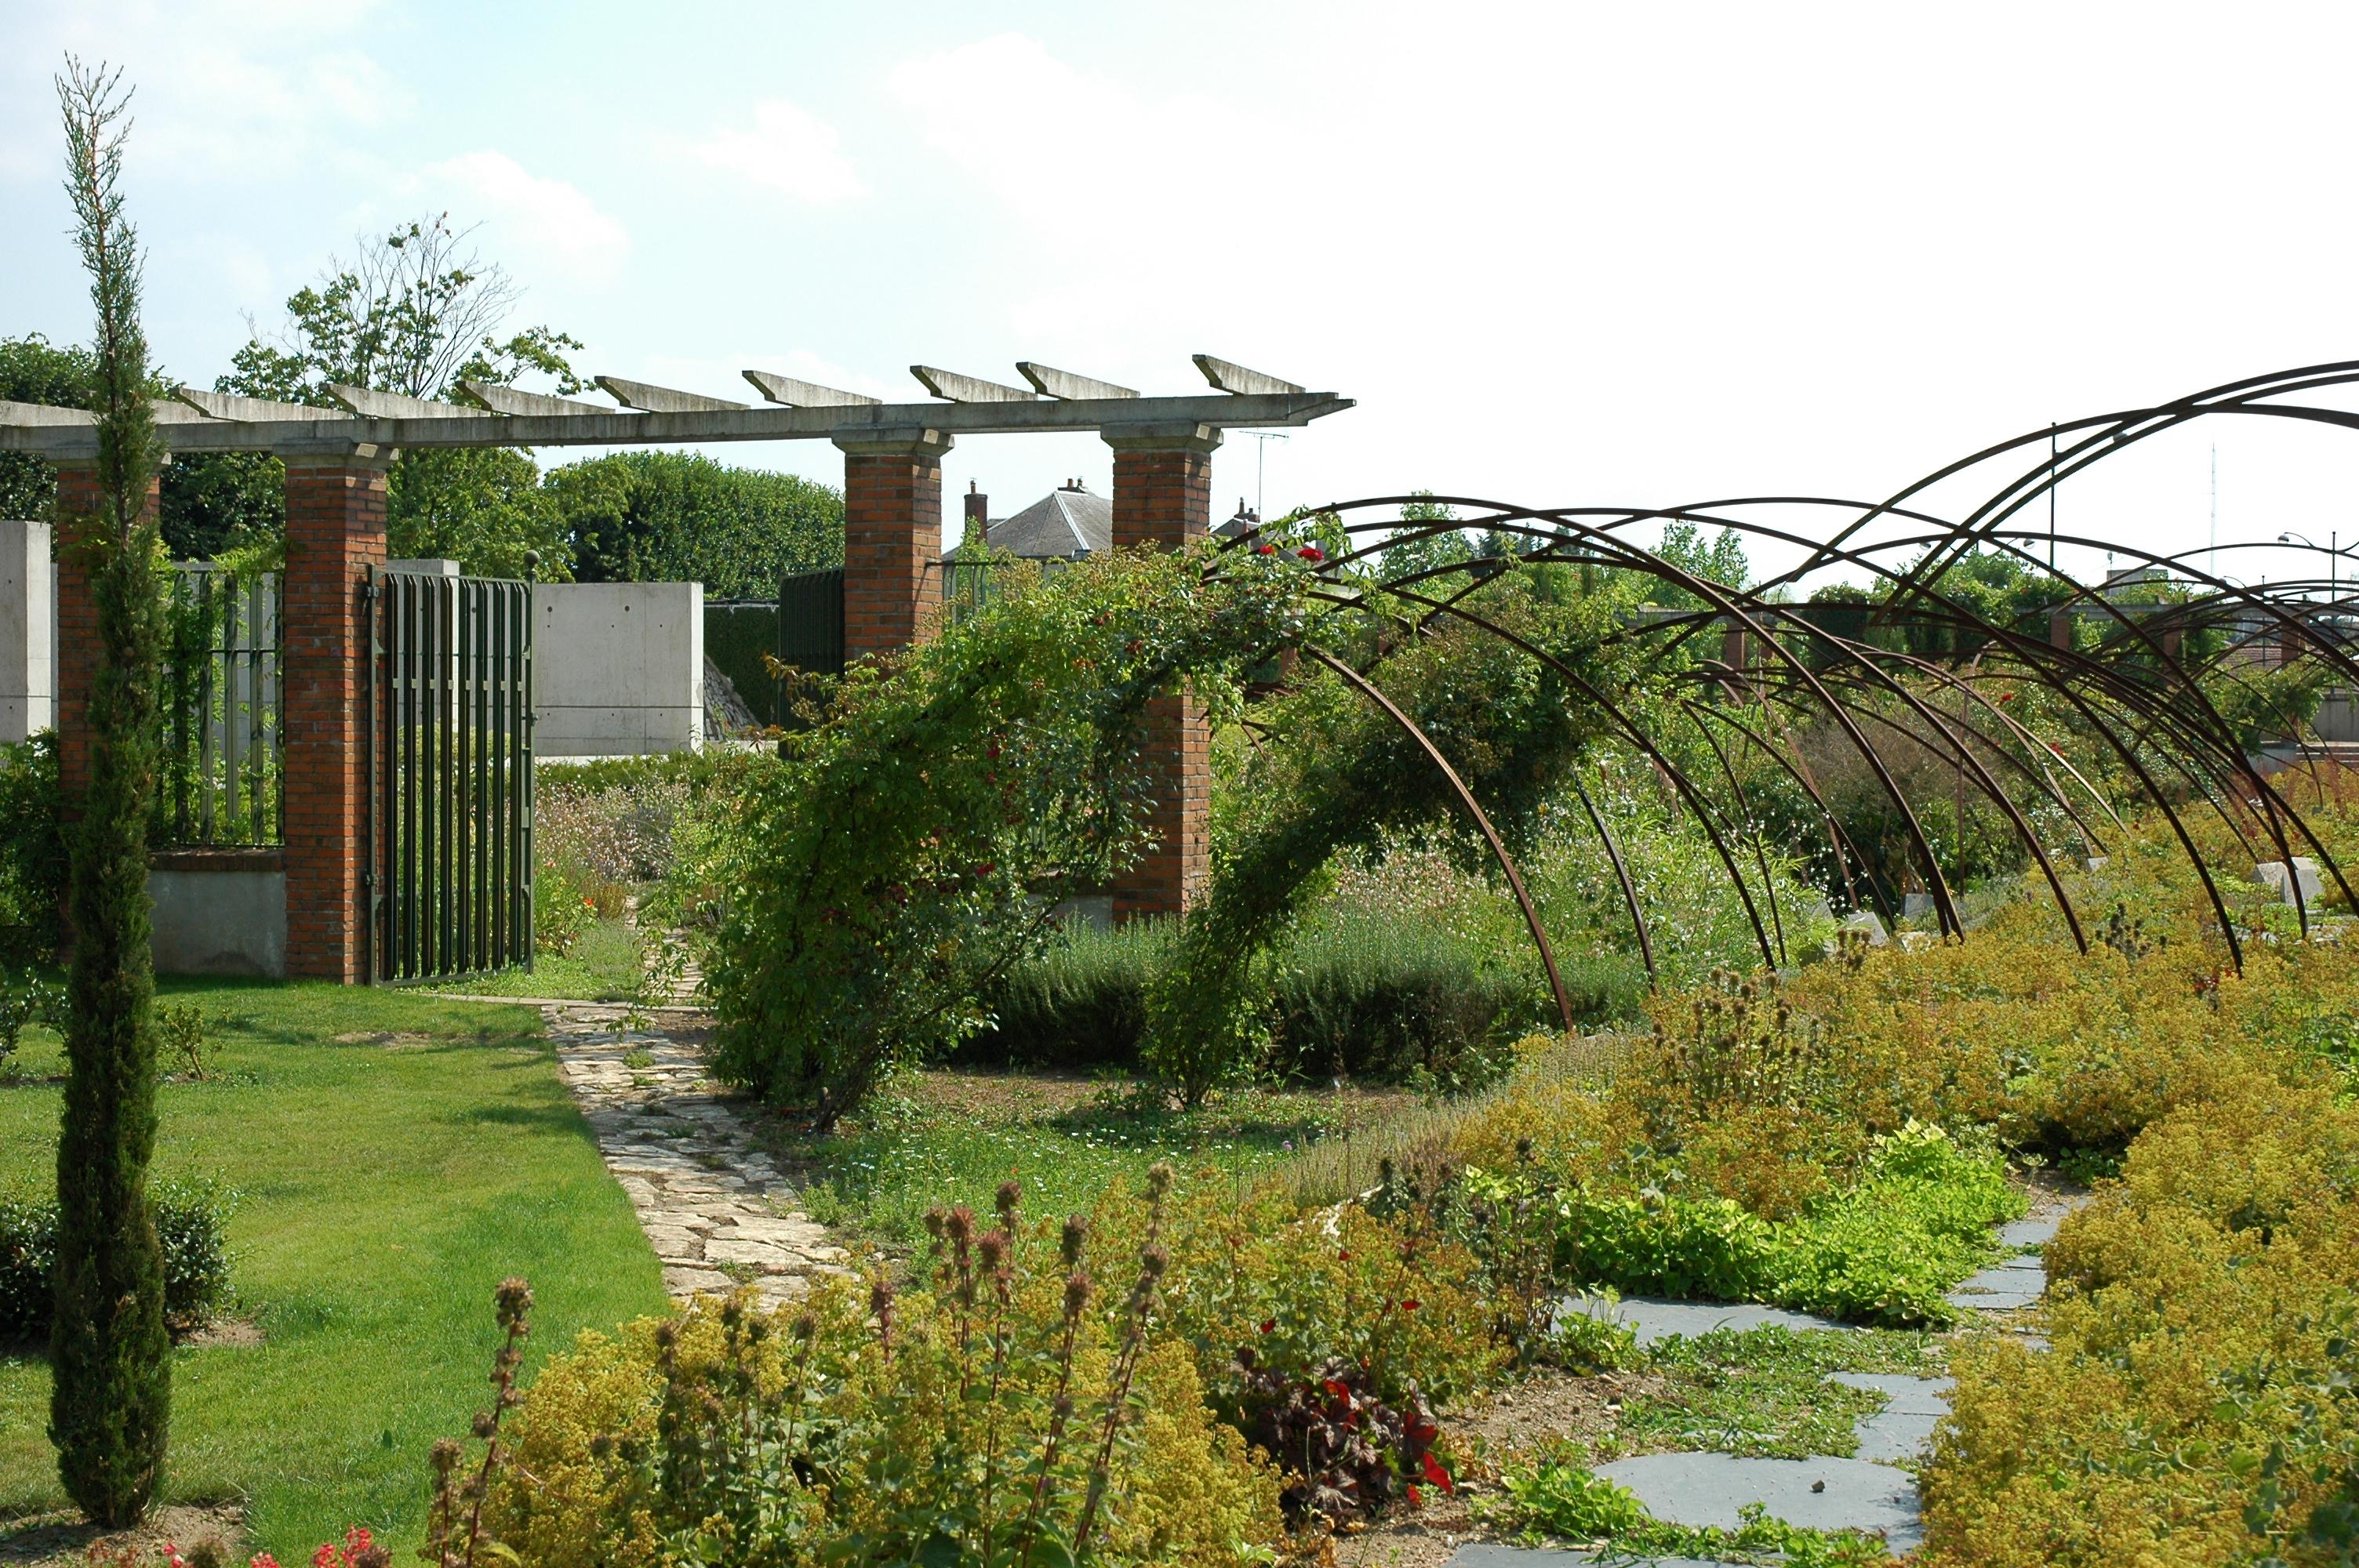 france orleans jardin des plantes 01 h tel saint aignan orl ans site officiel 10. Black Bedroom Furniture Sets. Home Design Ideas